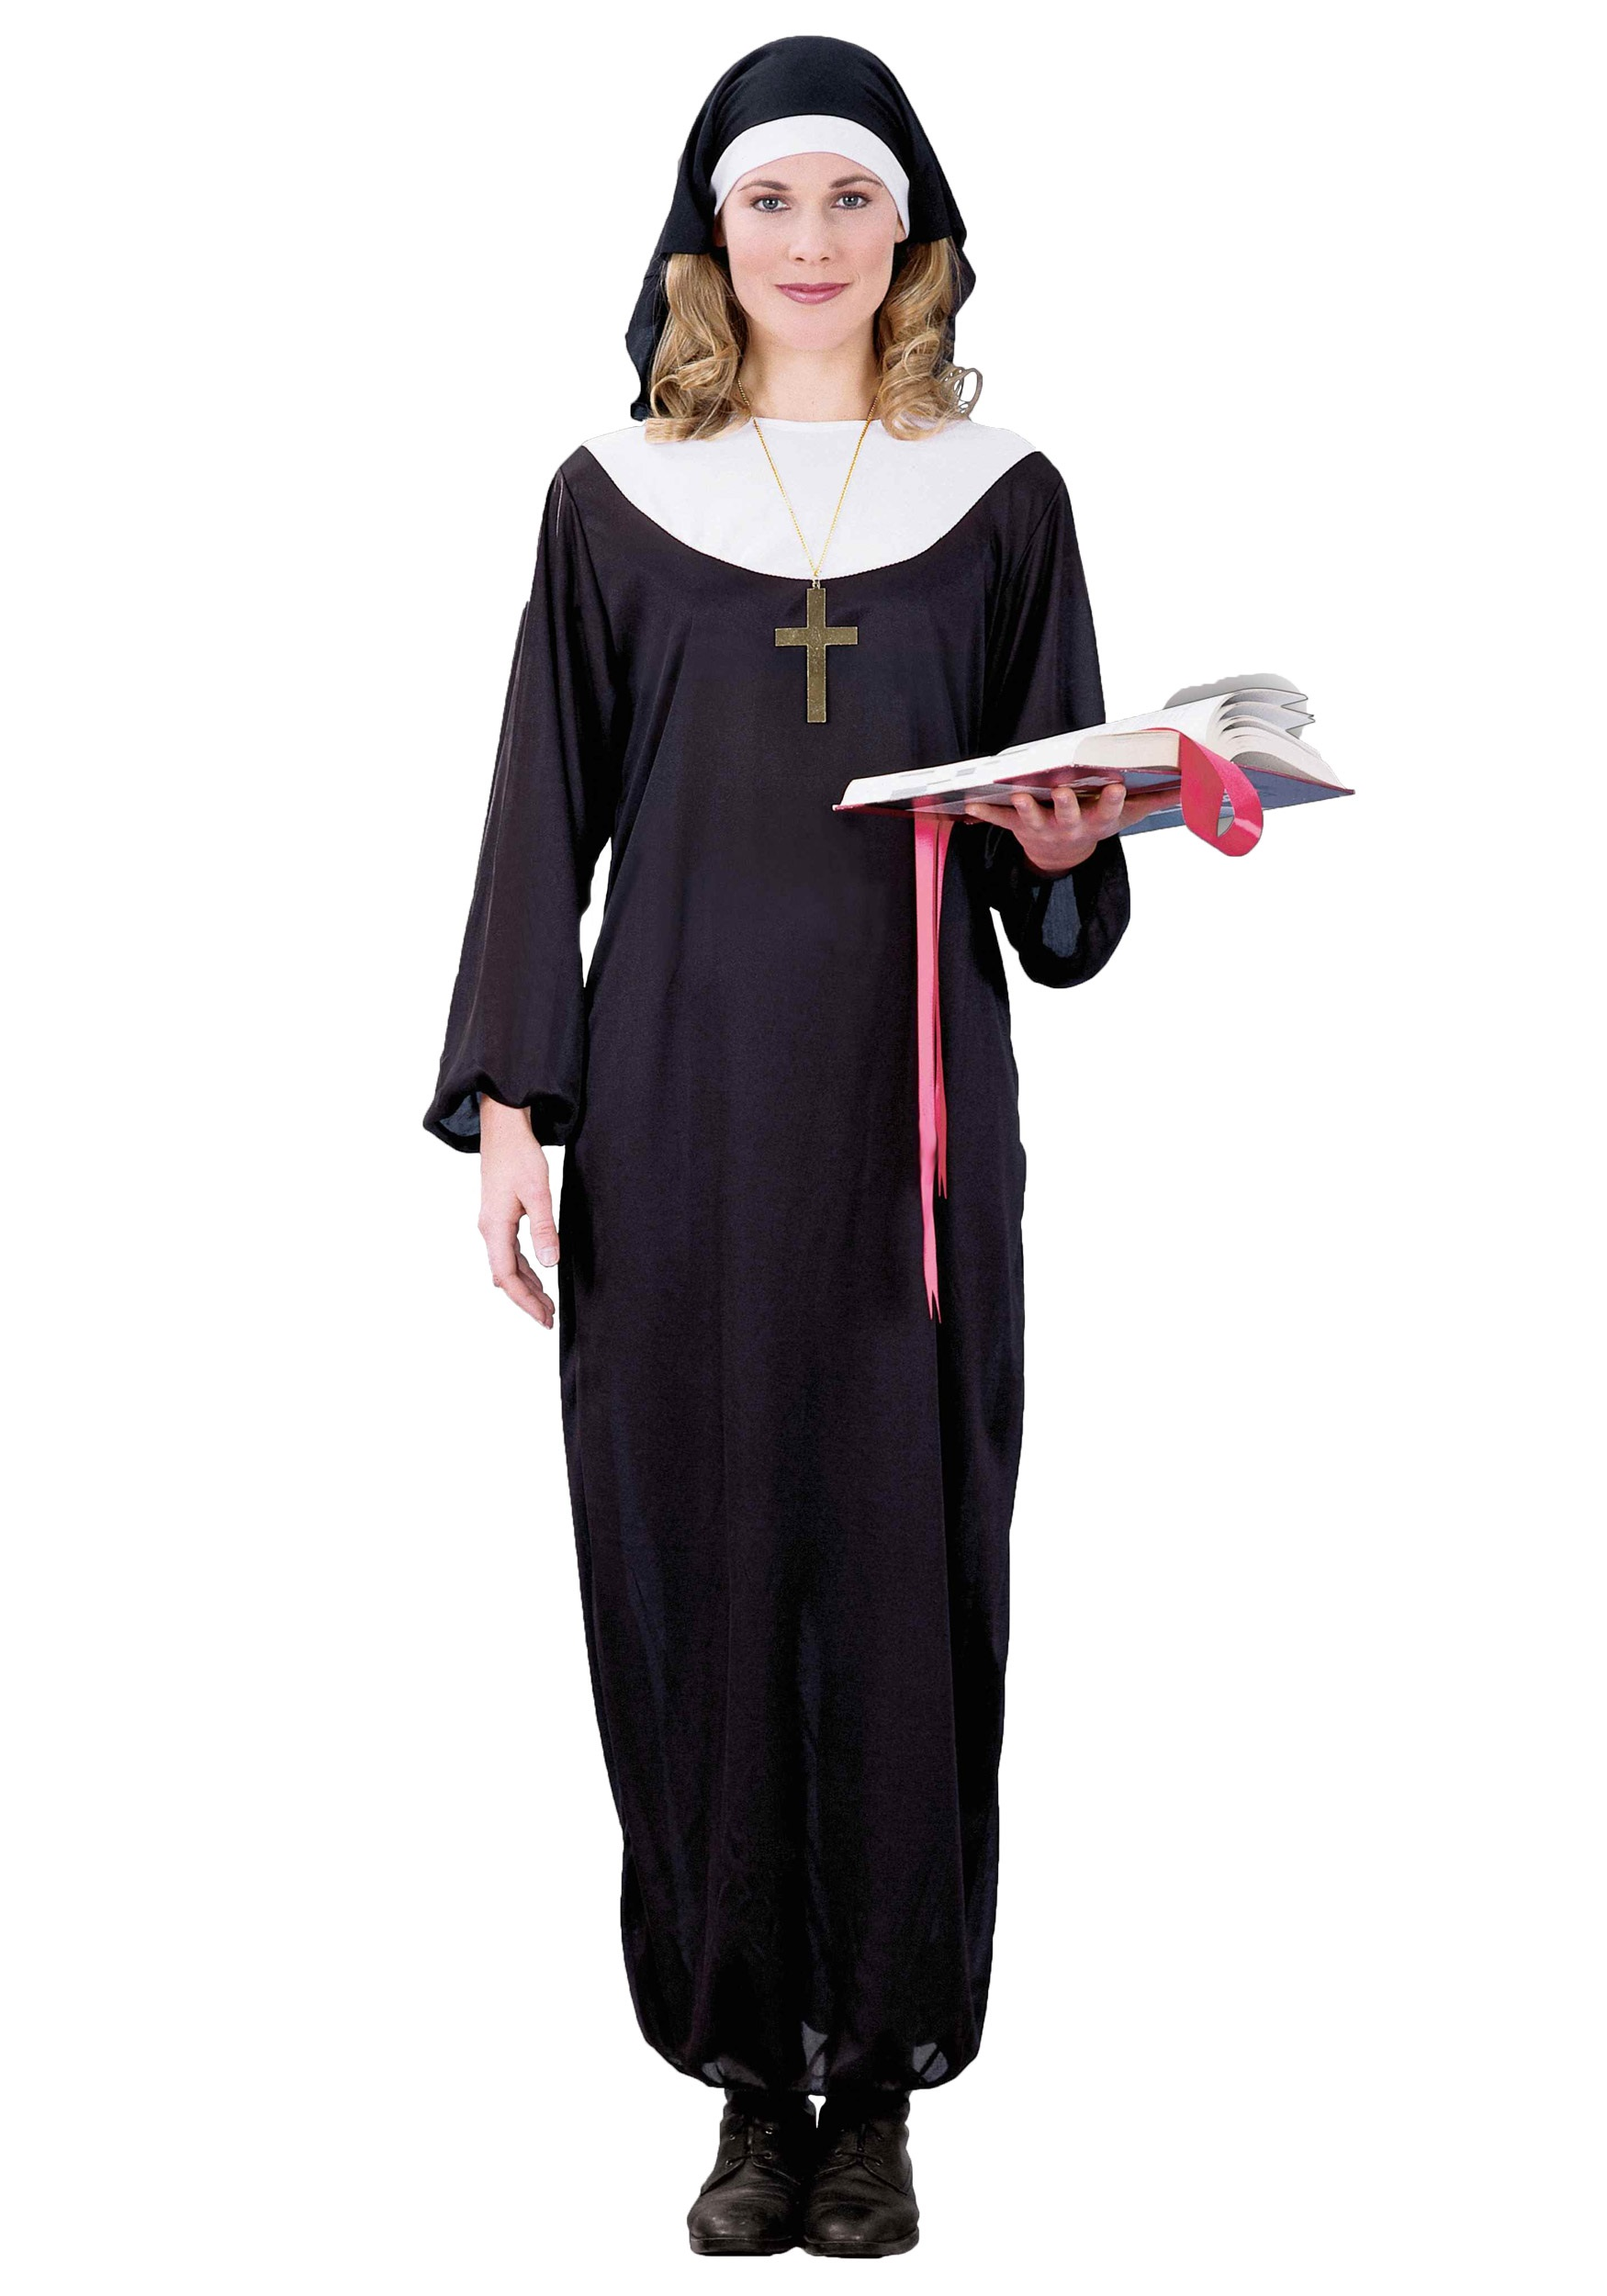 Adult Nun Costume - It Halloween Costume